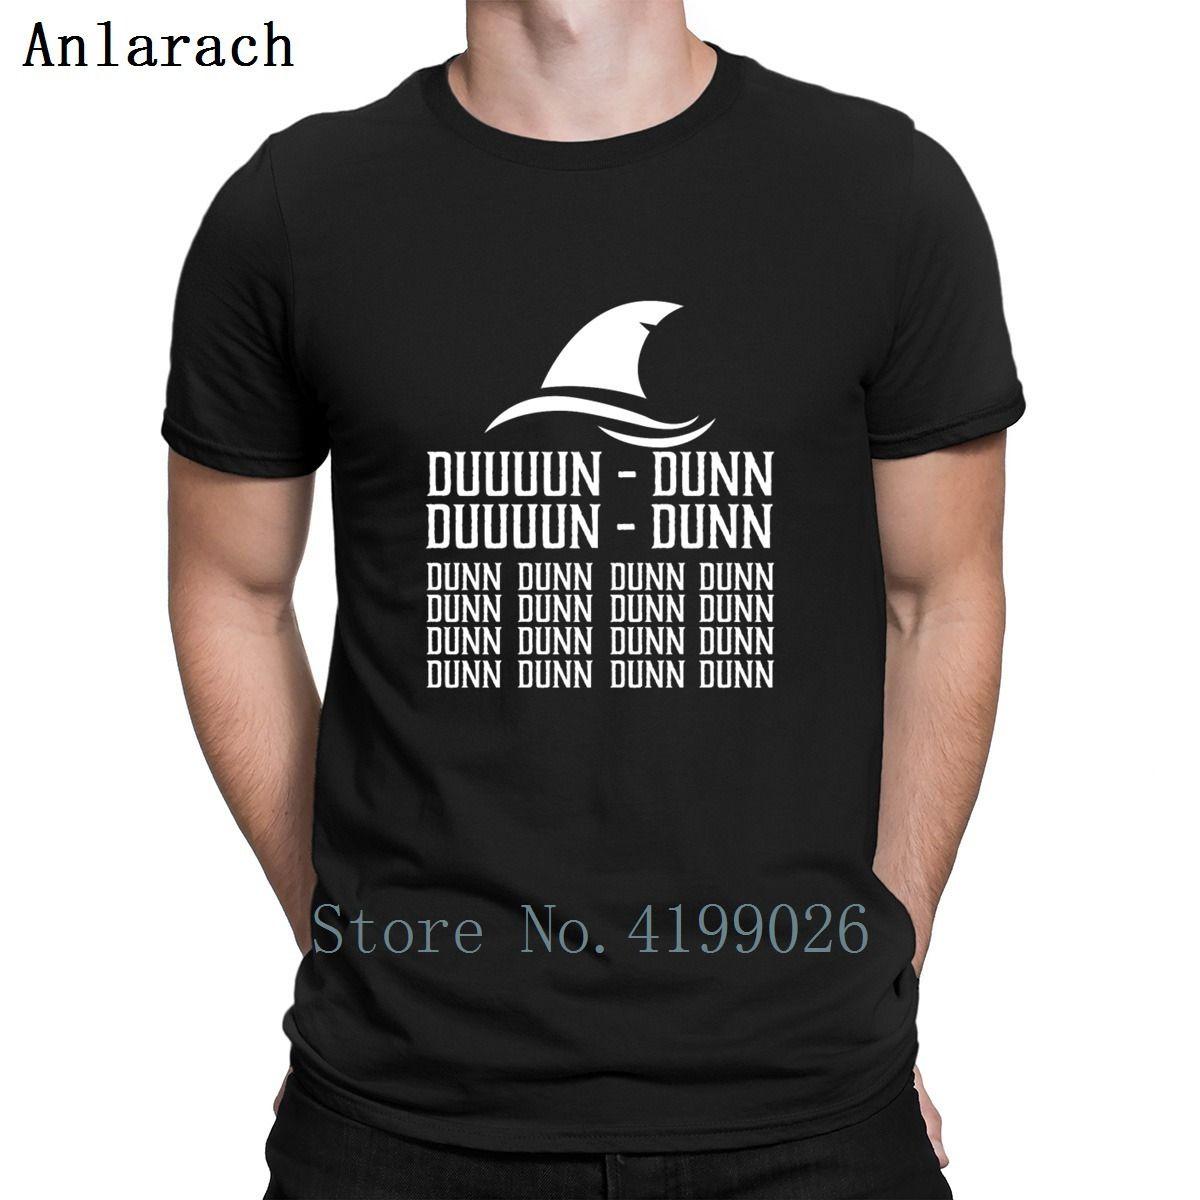 b0d1f5dbcd0 10 Funny Shark Fin Tshirts Super Summer Slim Fit Leisure Men's Tshirt  Designer Male Tops Anlarach Short Sleeve